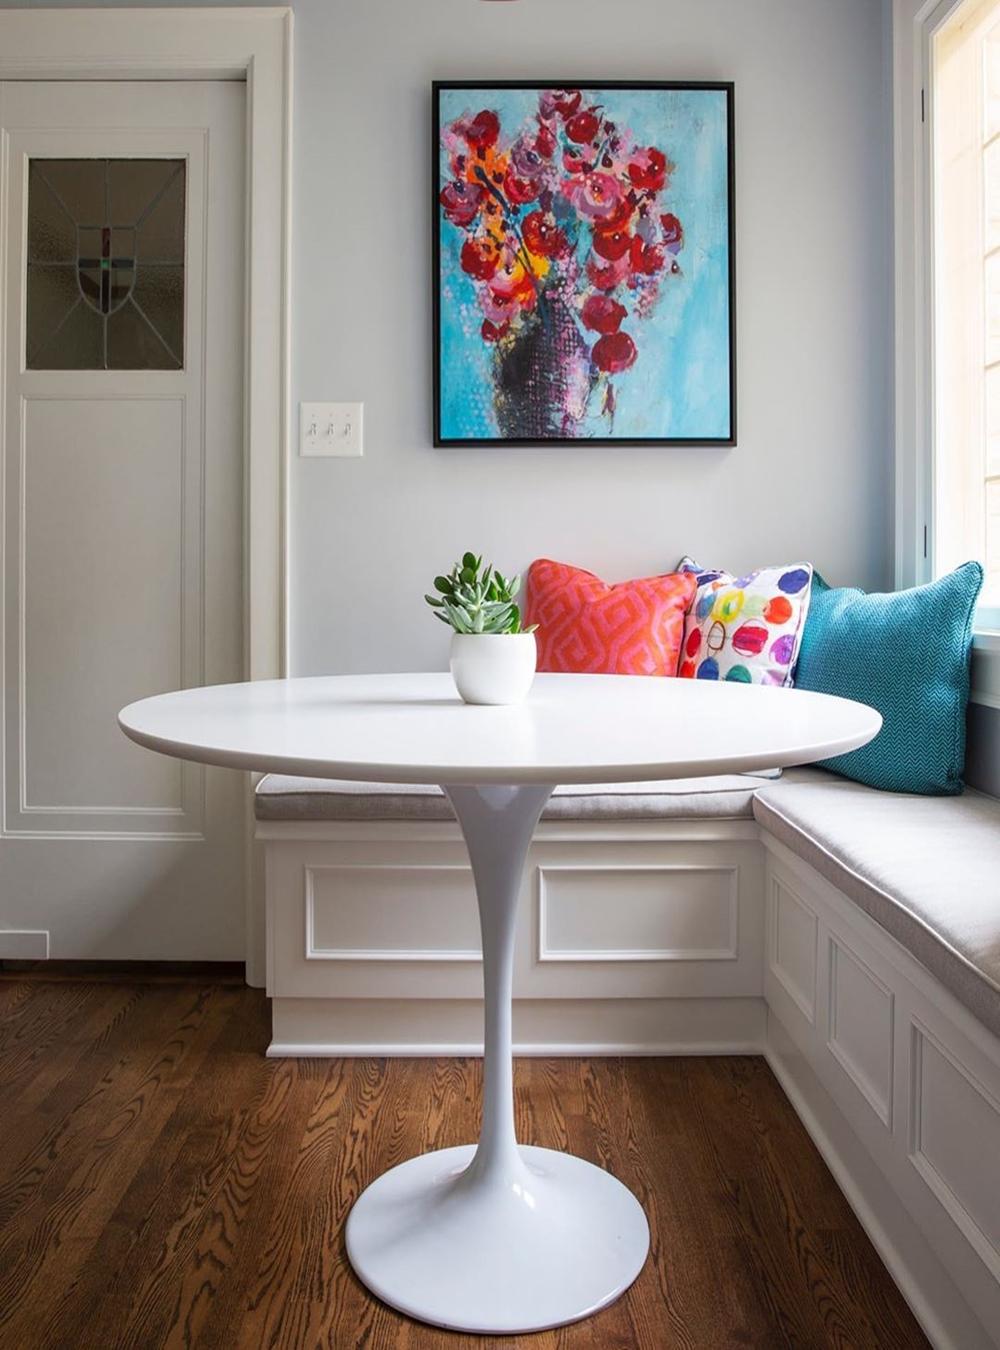 15 Delightful Corner Kitchen Table With Storage Bench Ideas Corner Kitchen Tables Corner Bench Kitchen Table Dining Table With Bench